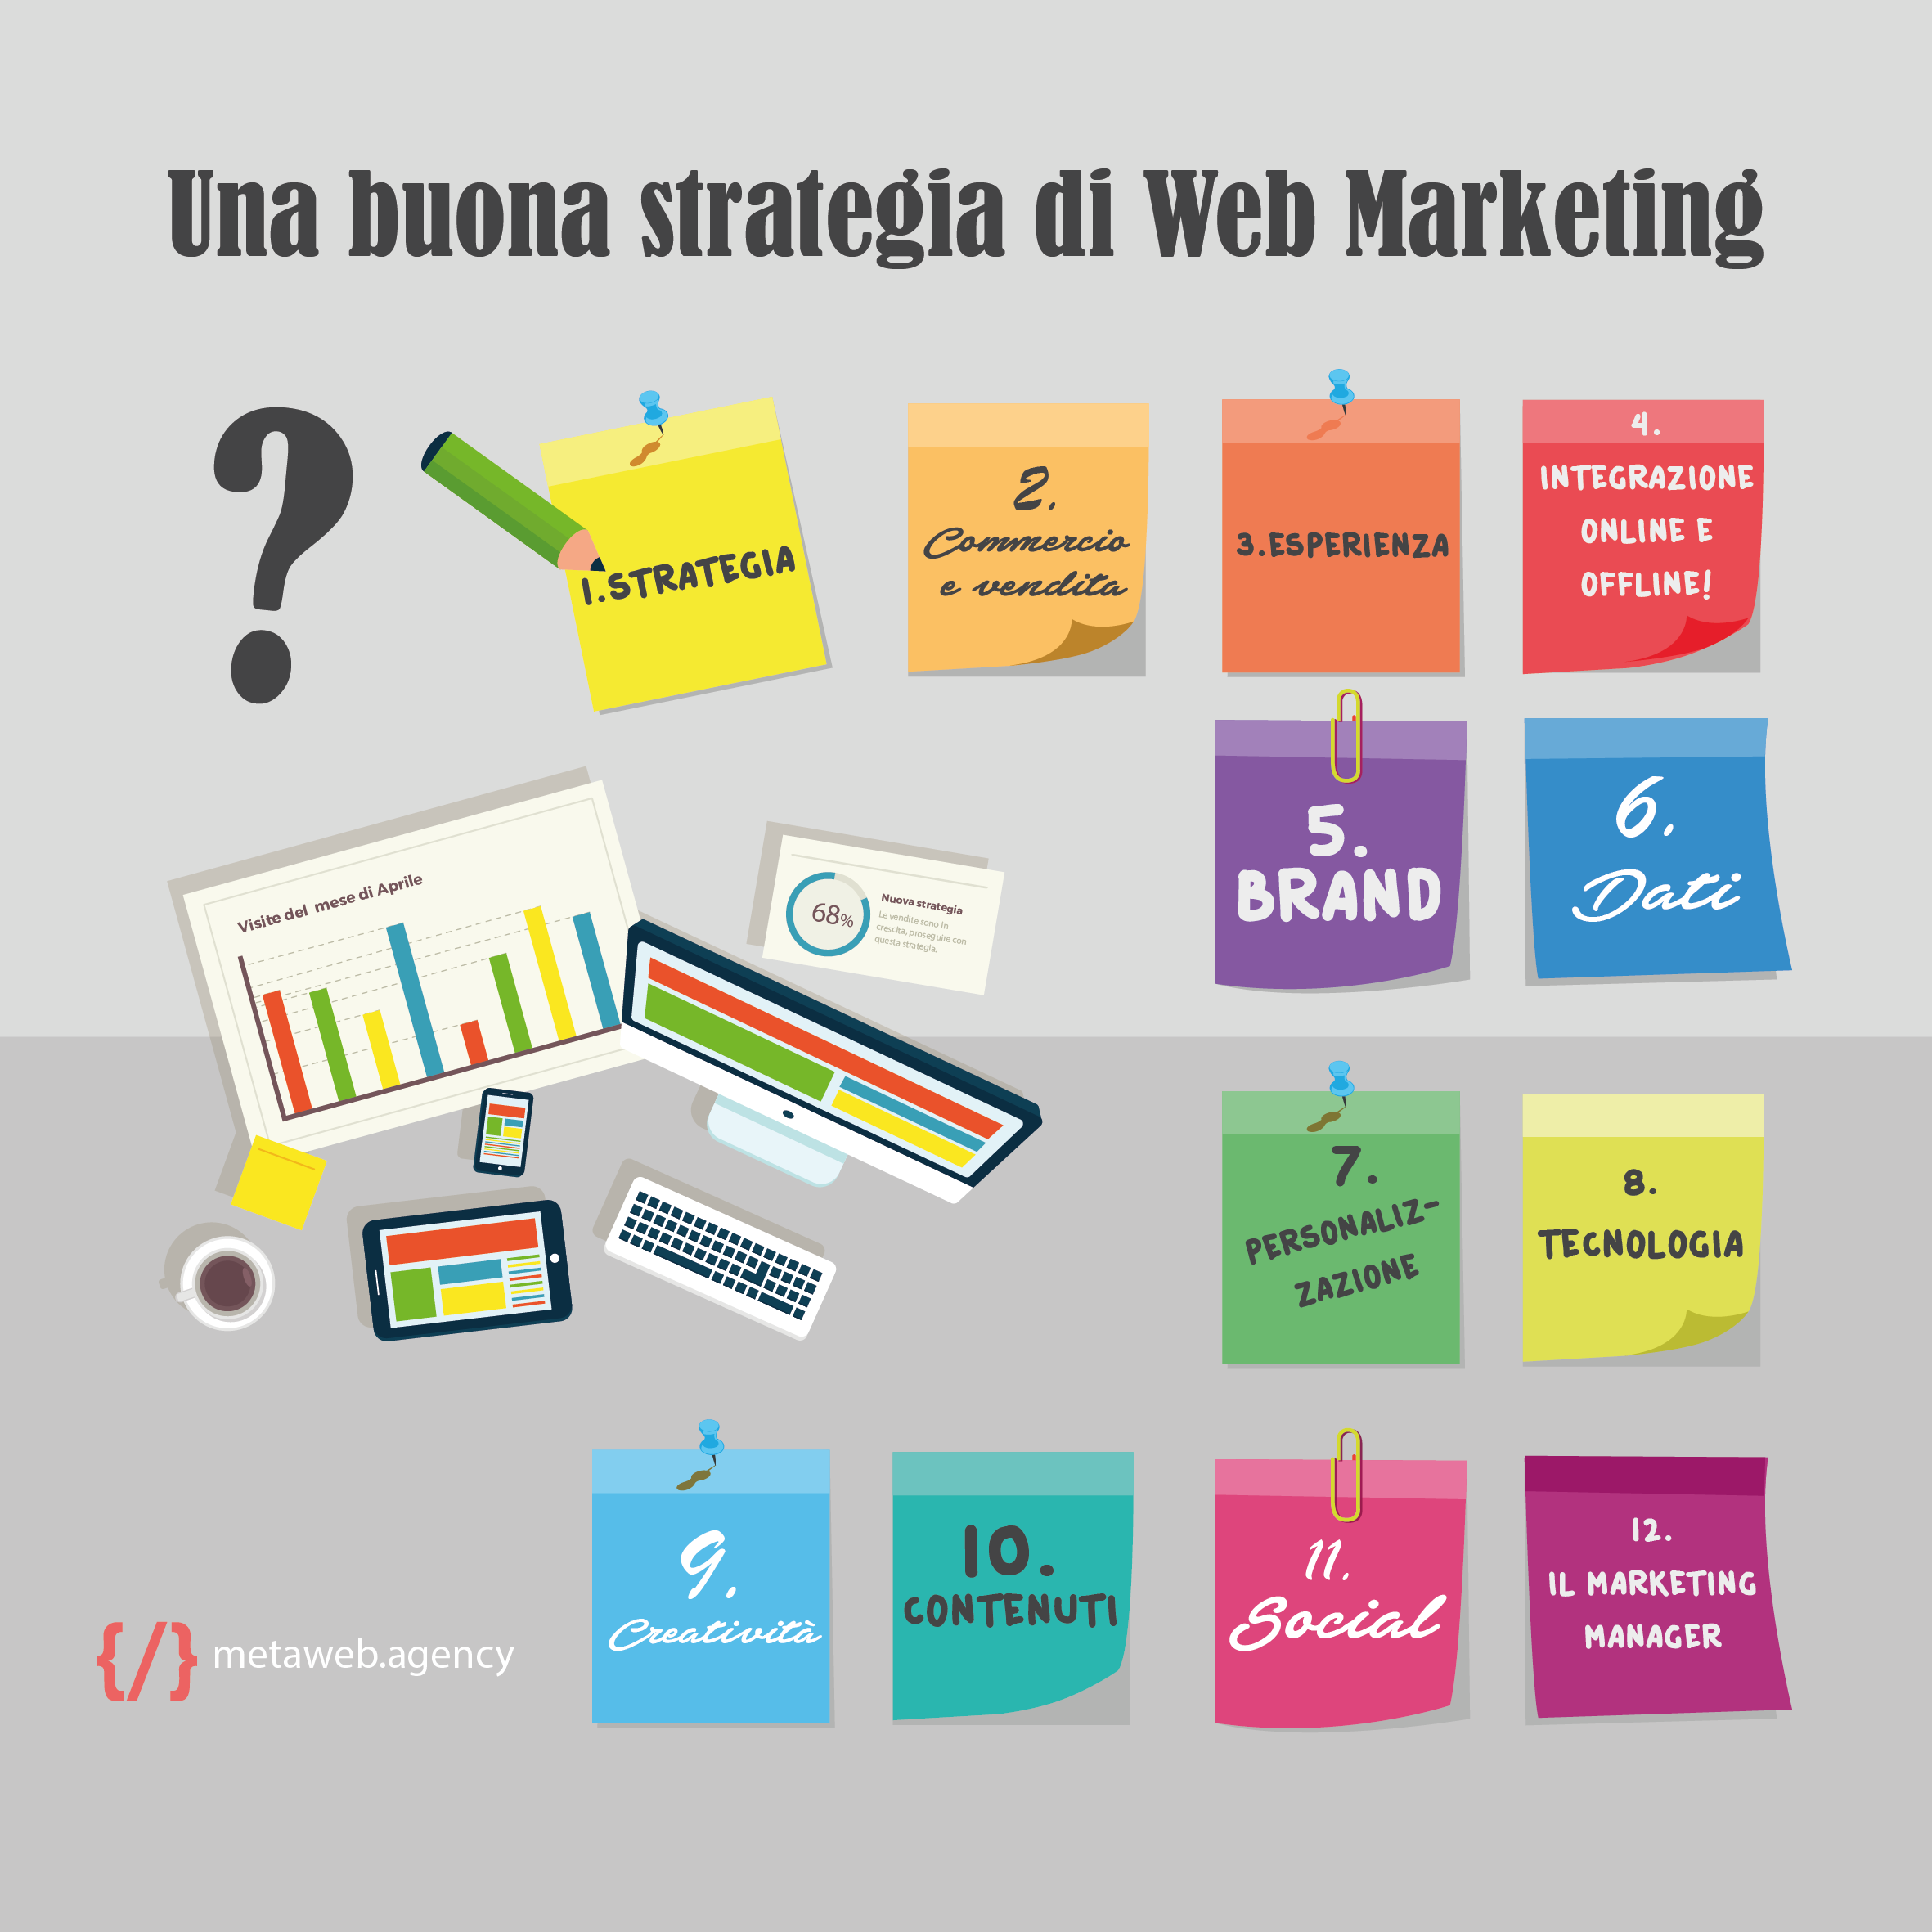 Web Marketing in Valtellina - strategia aziendale - Metaweb